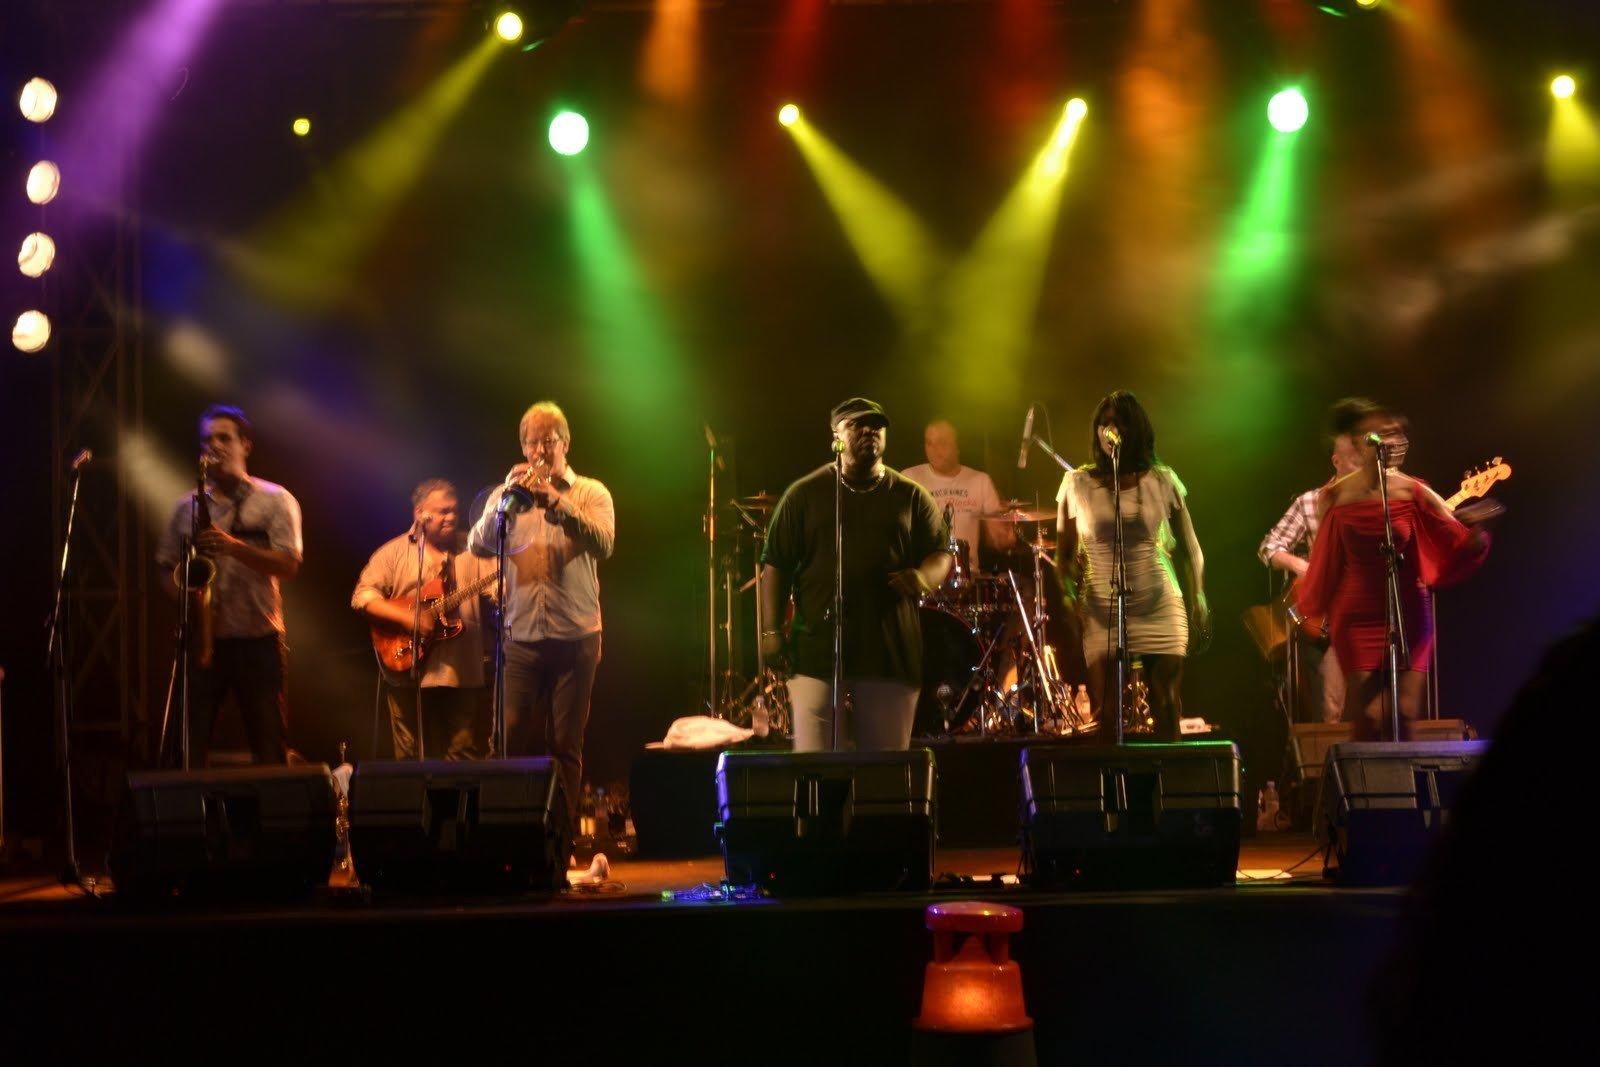 Jazzy Festival 2013 – October 18-19